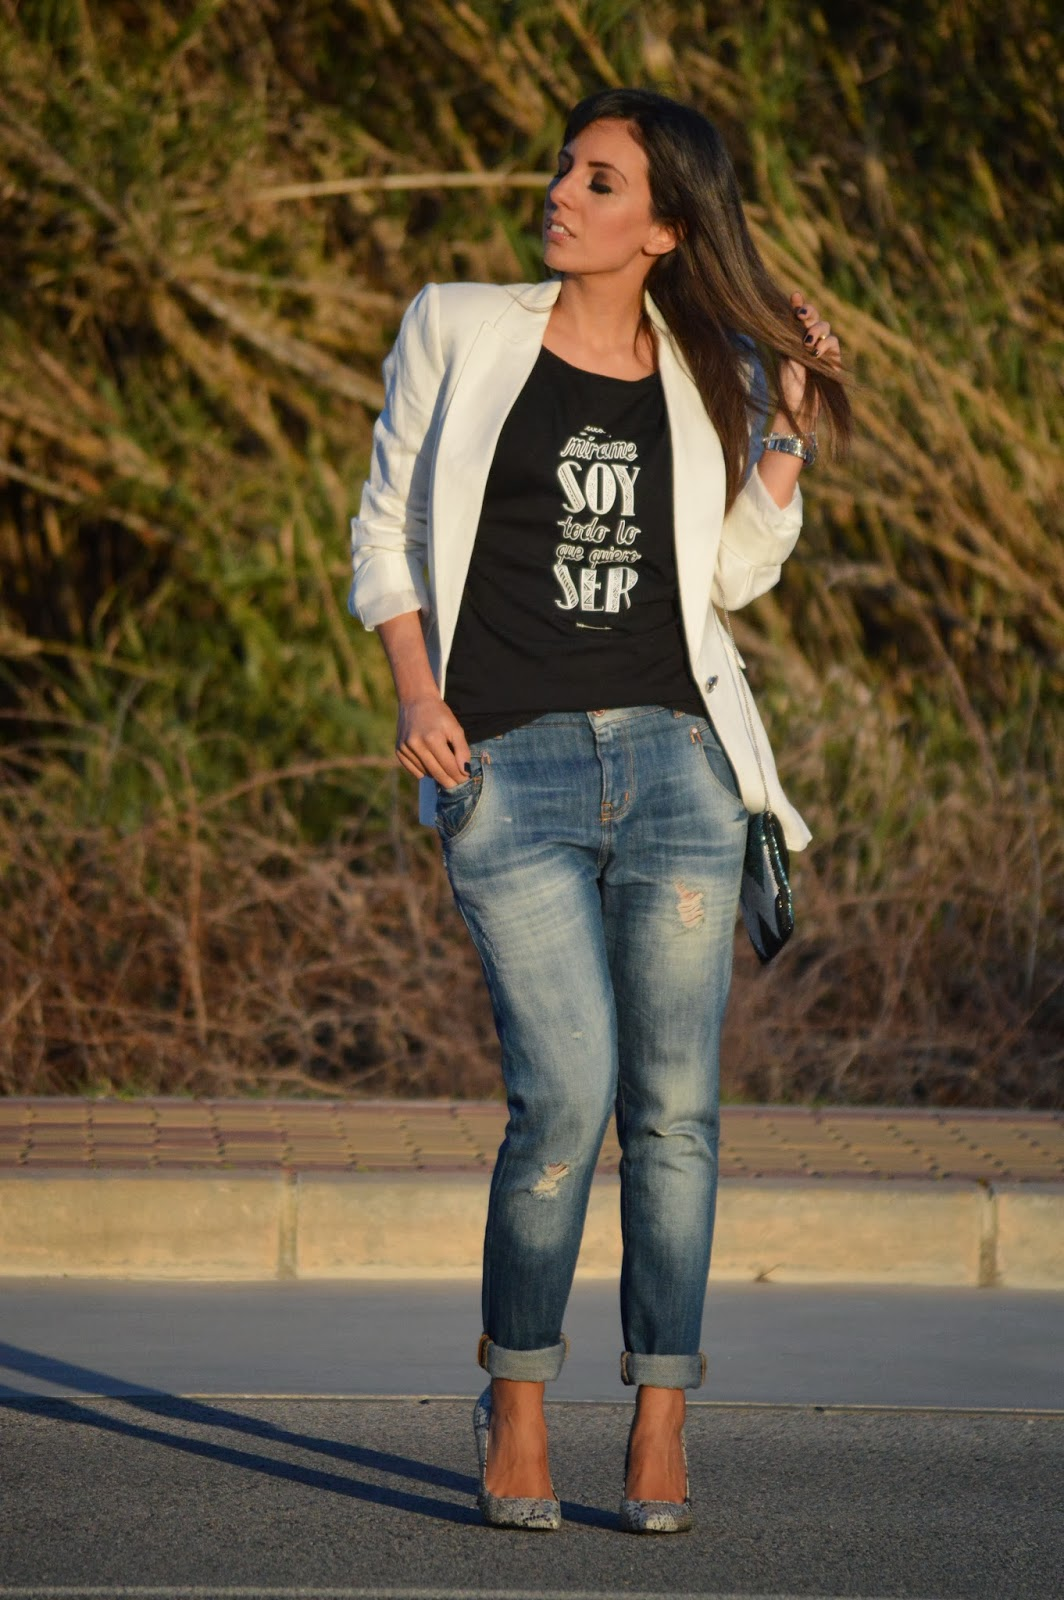 cristina style fashion blogger malagueña blogger malagueña street style fashion ootd inspiration trendy tendencias moda outfit look chic cool casual lovely gorgeous zara mango